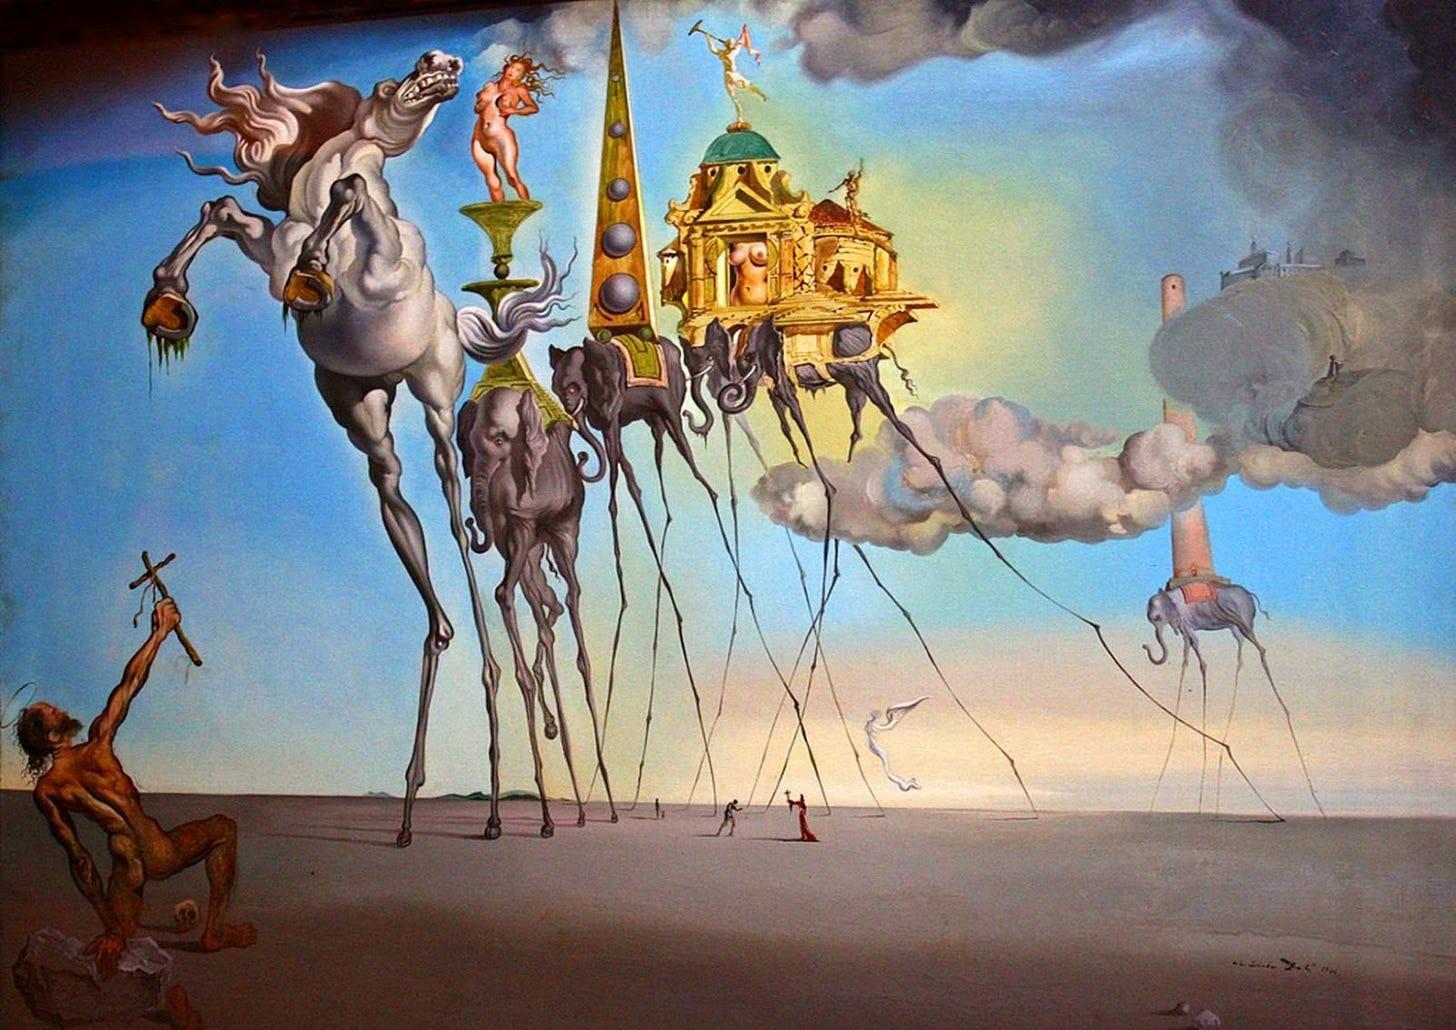 Surrealism in the Art of Dali. Salvador Dali was a leading 20th… | by Alya  Khemji | Medium